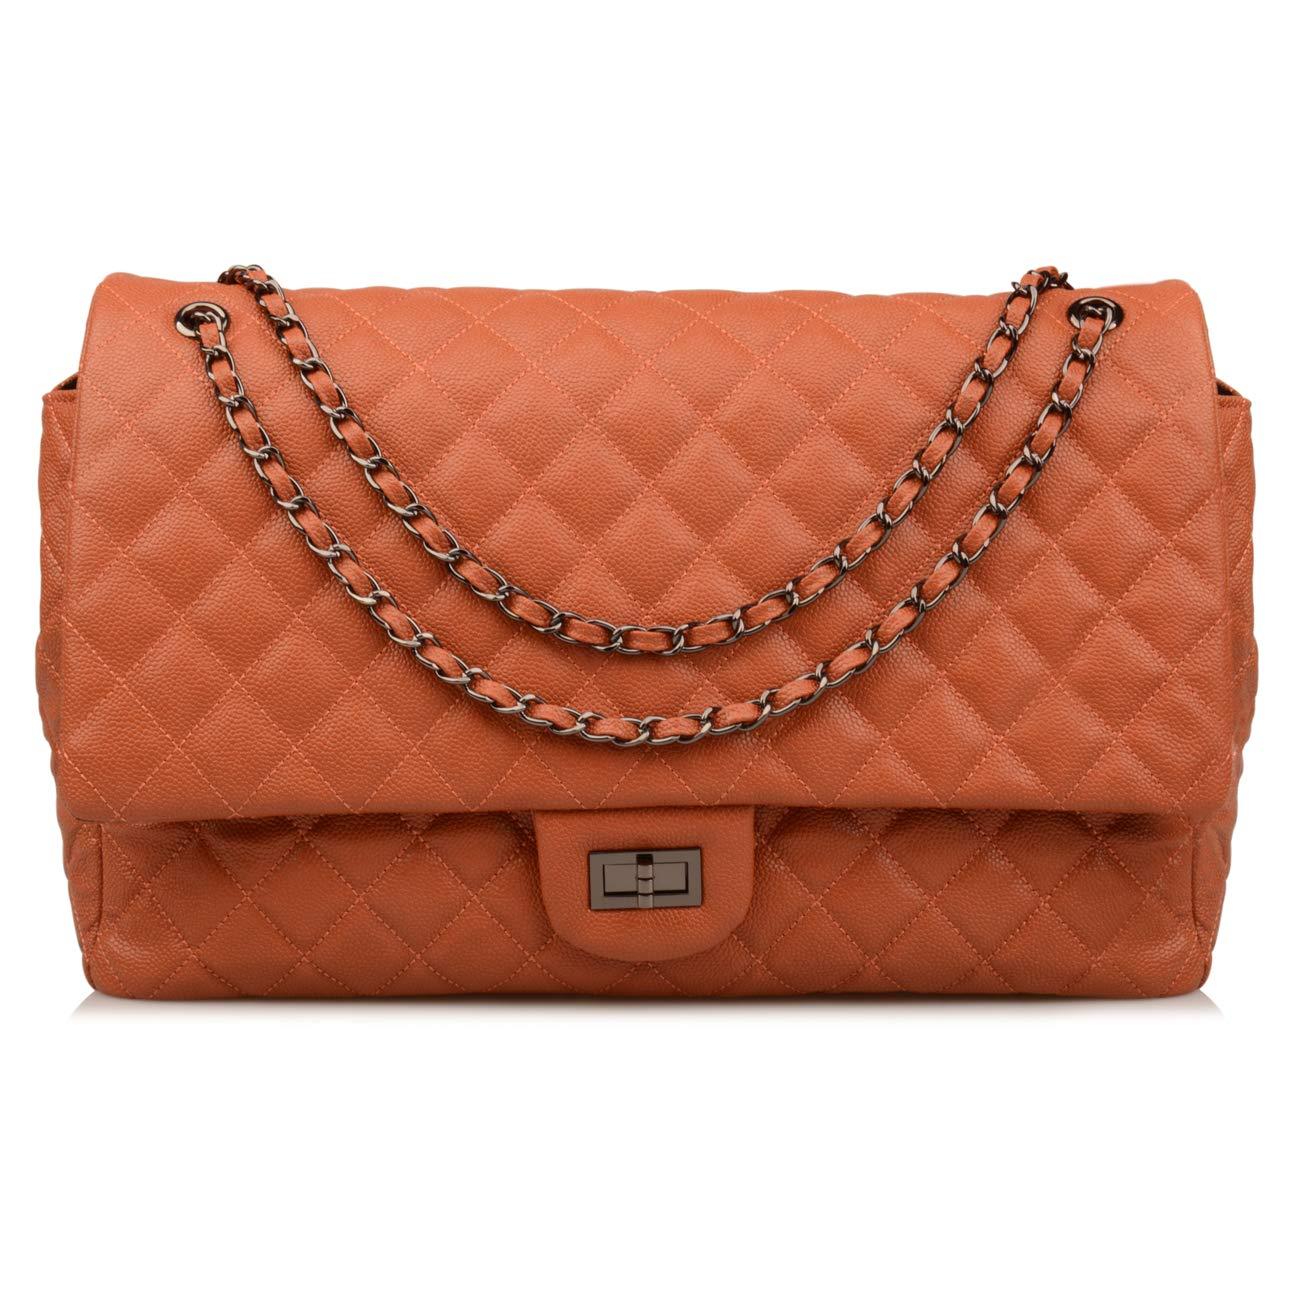 Ainifeel Women's Genuine Leather Oversize Quilted Flap Handbag Large Travelling Tote Bag Luggage Holdall (Oversize, Redish brown (gunmetal hardware))